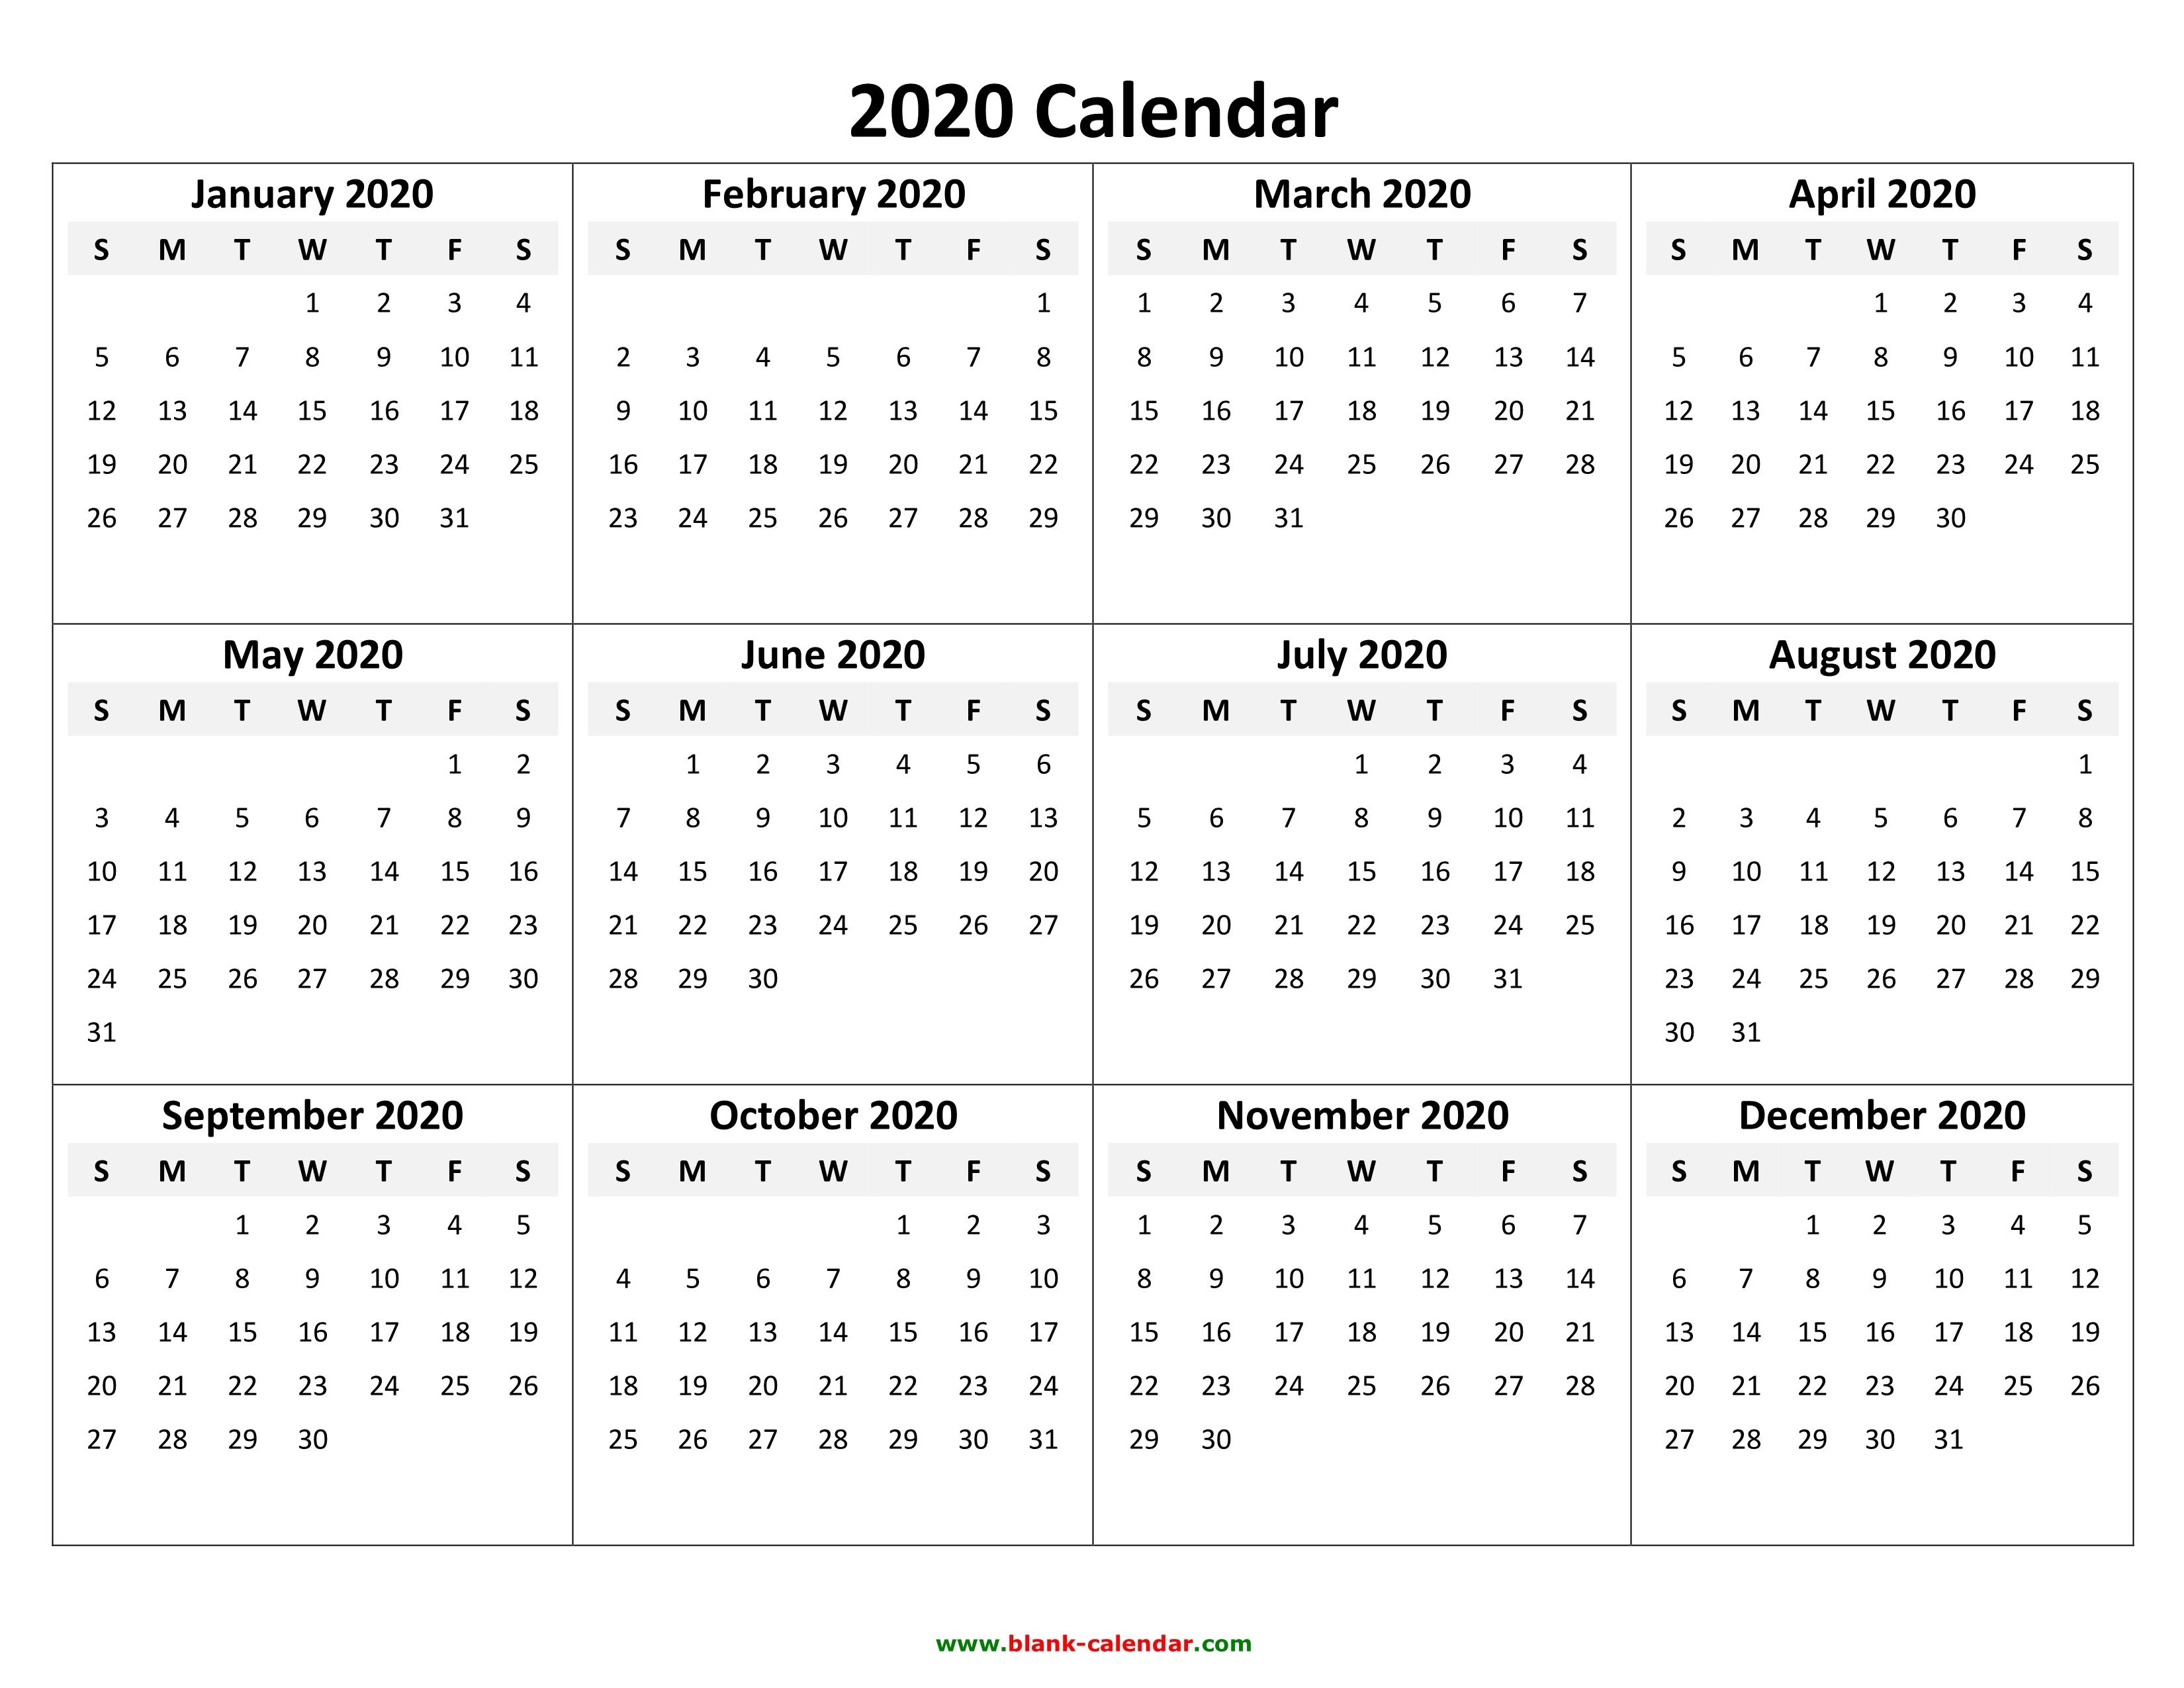 2020 2020 Calendar Printable   Isacl